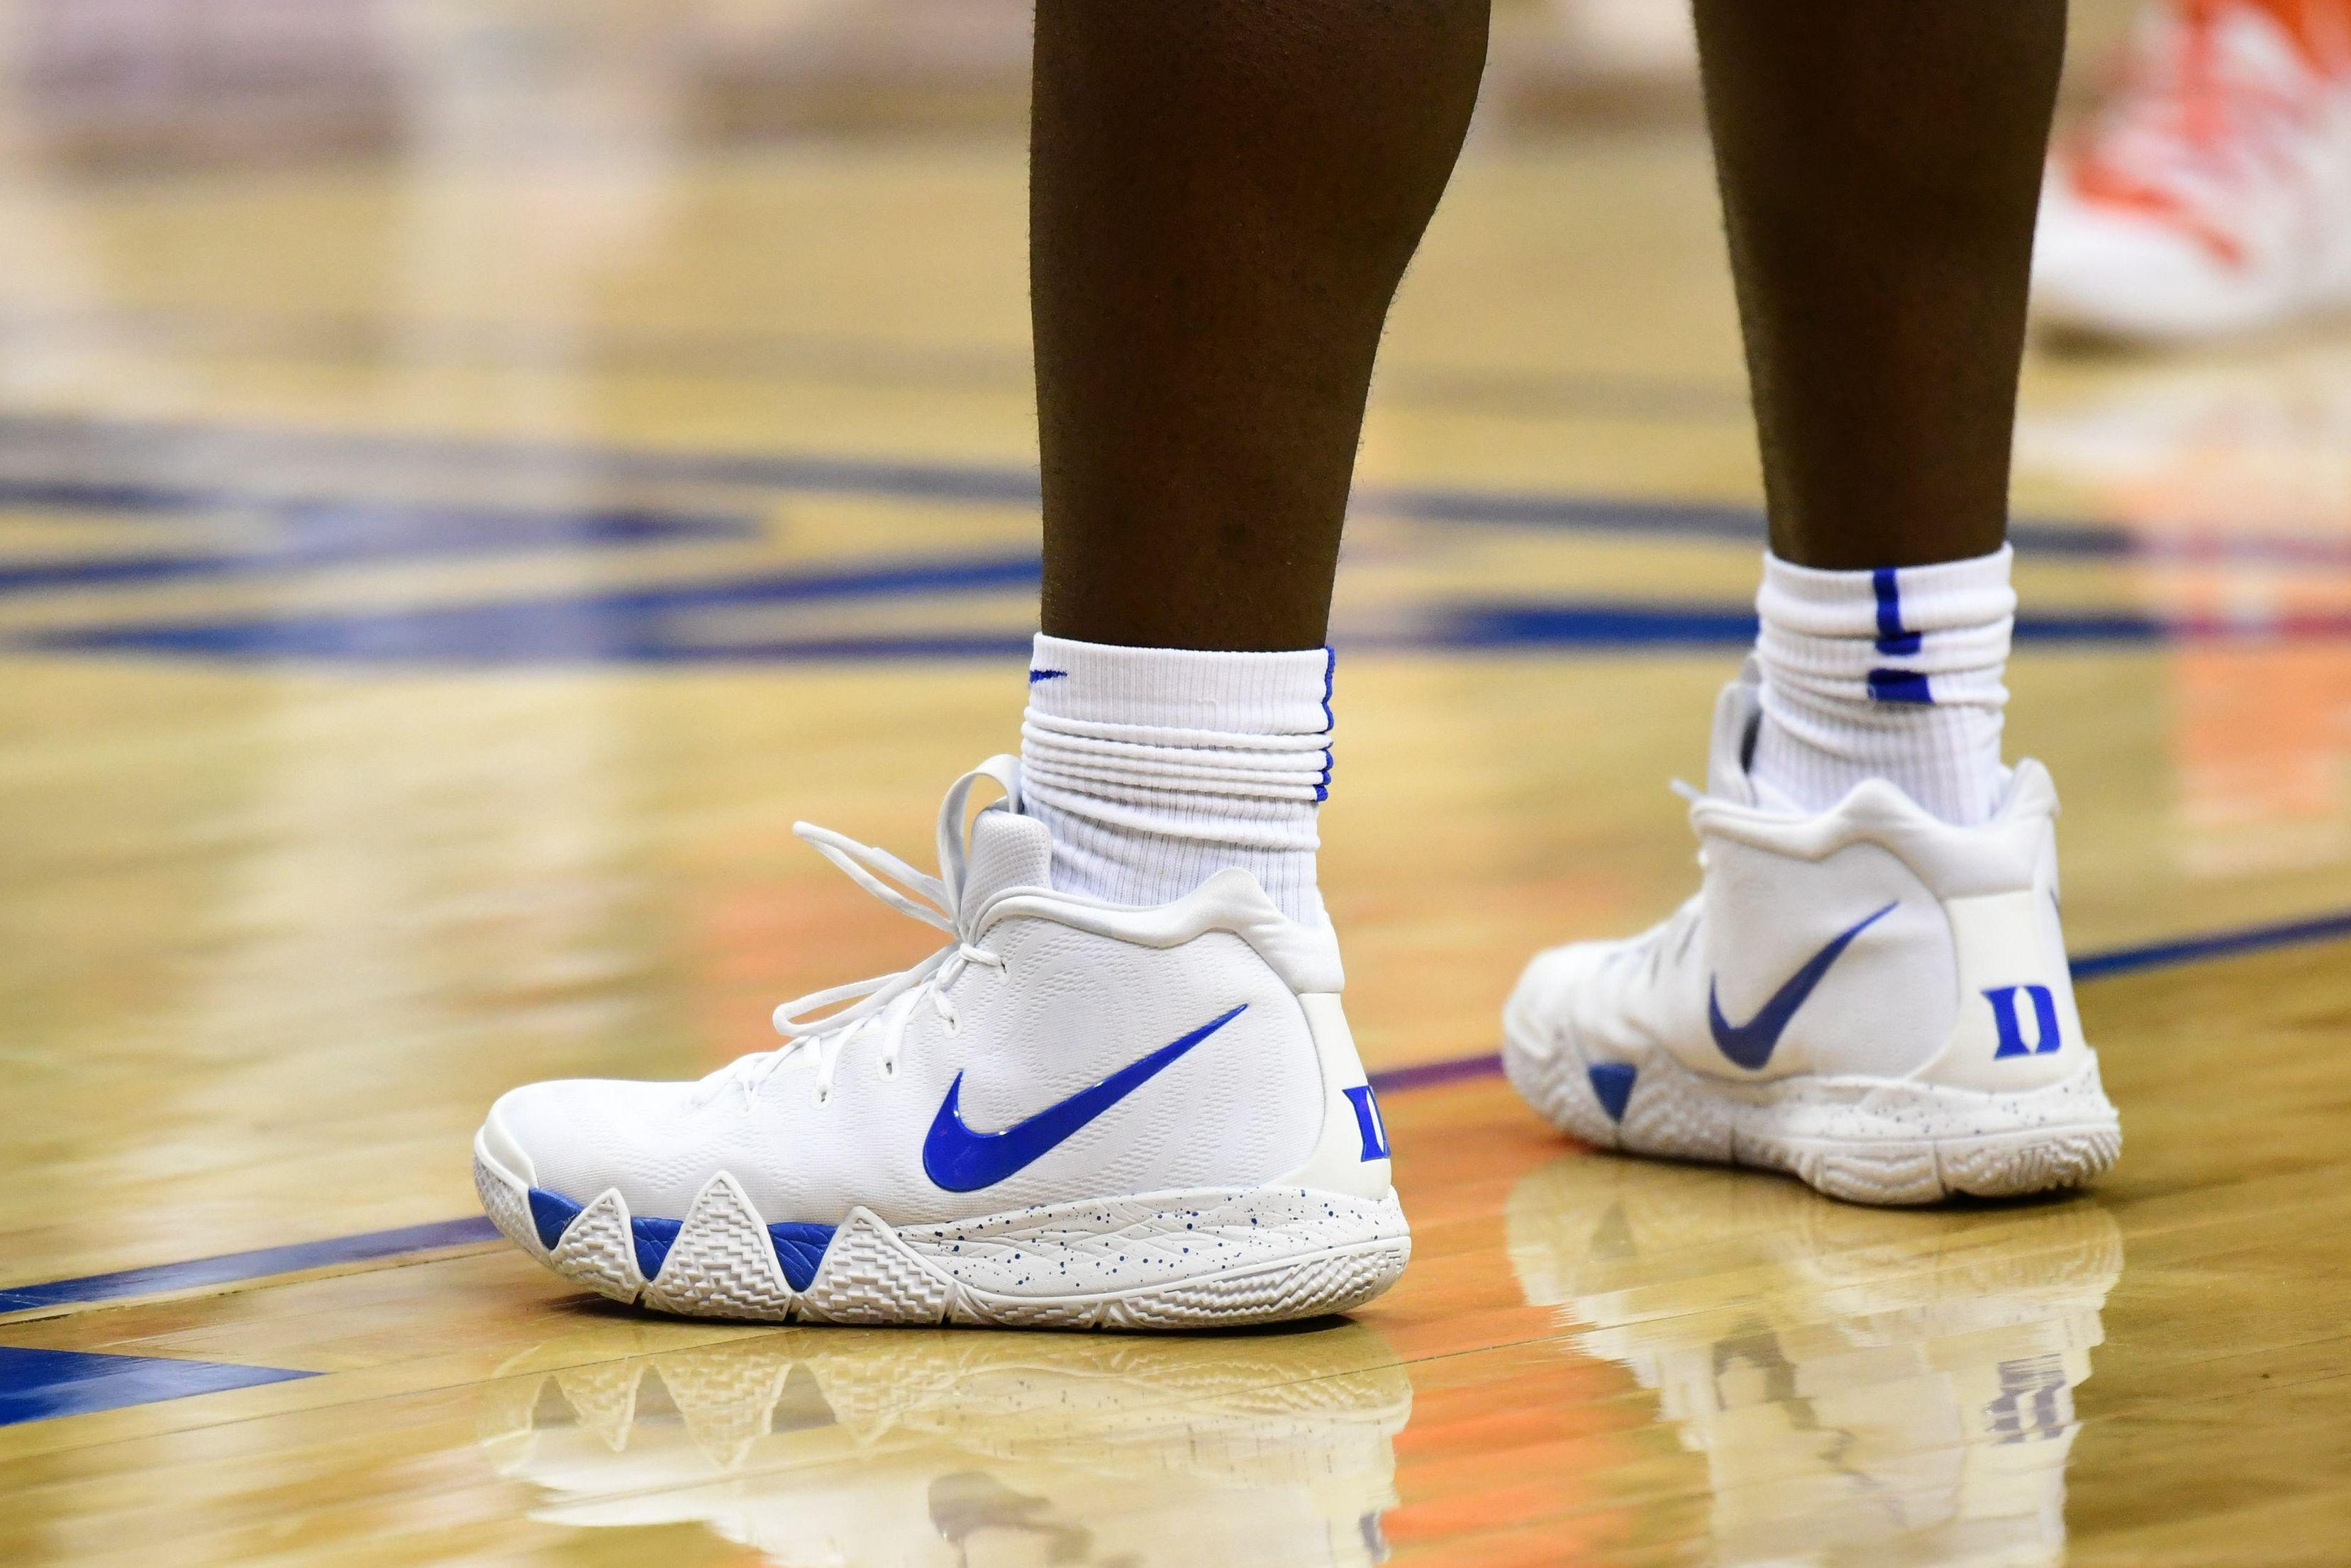 Zion Williamson Wore Nike Kryrie 4